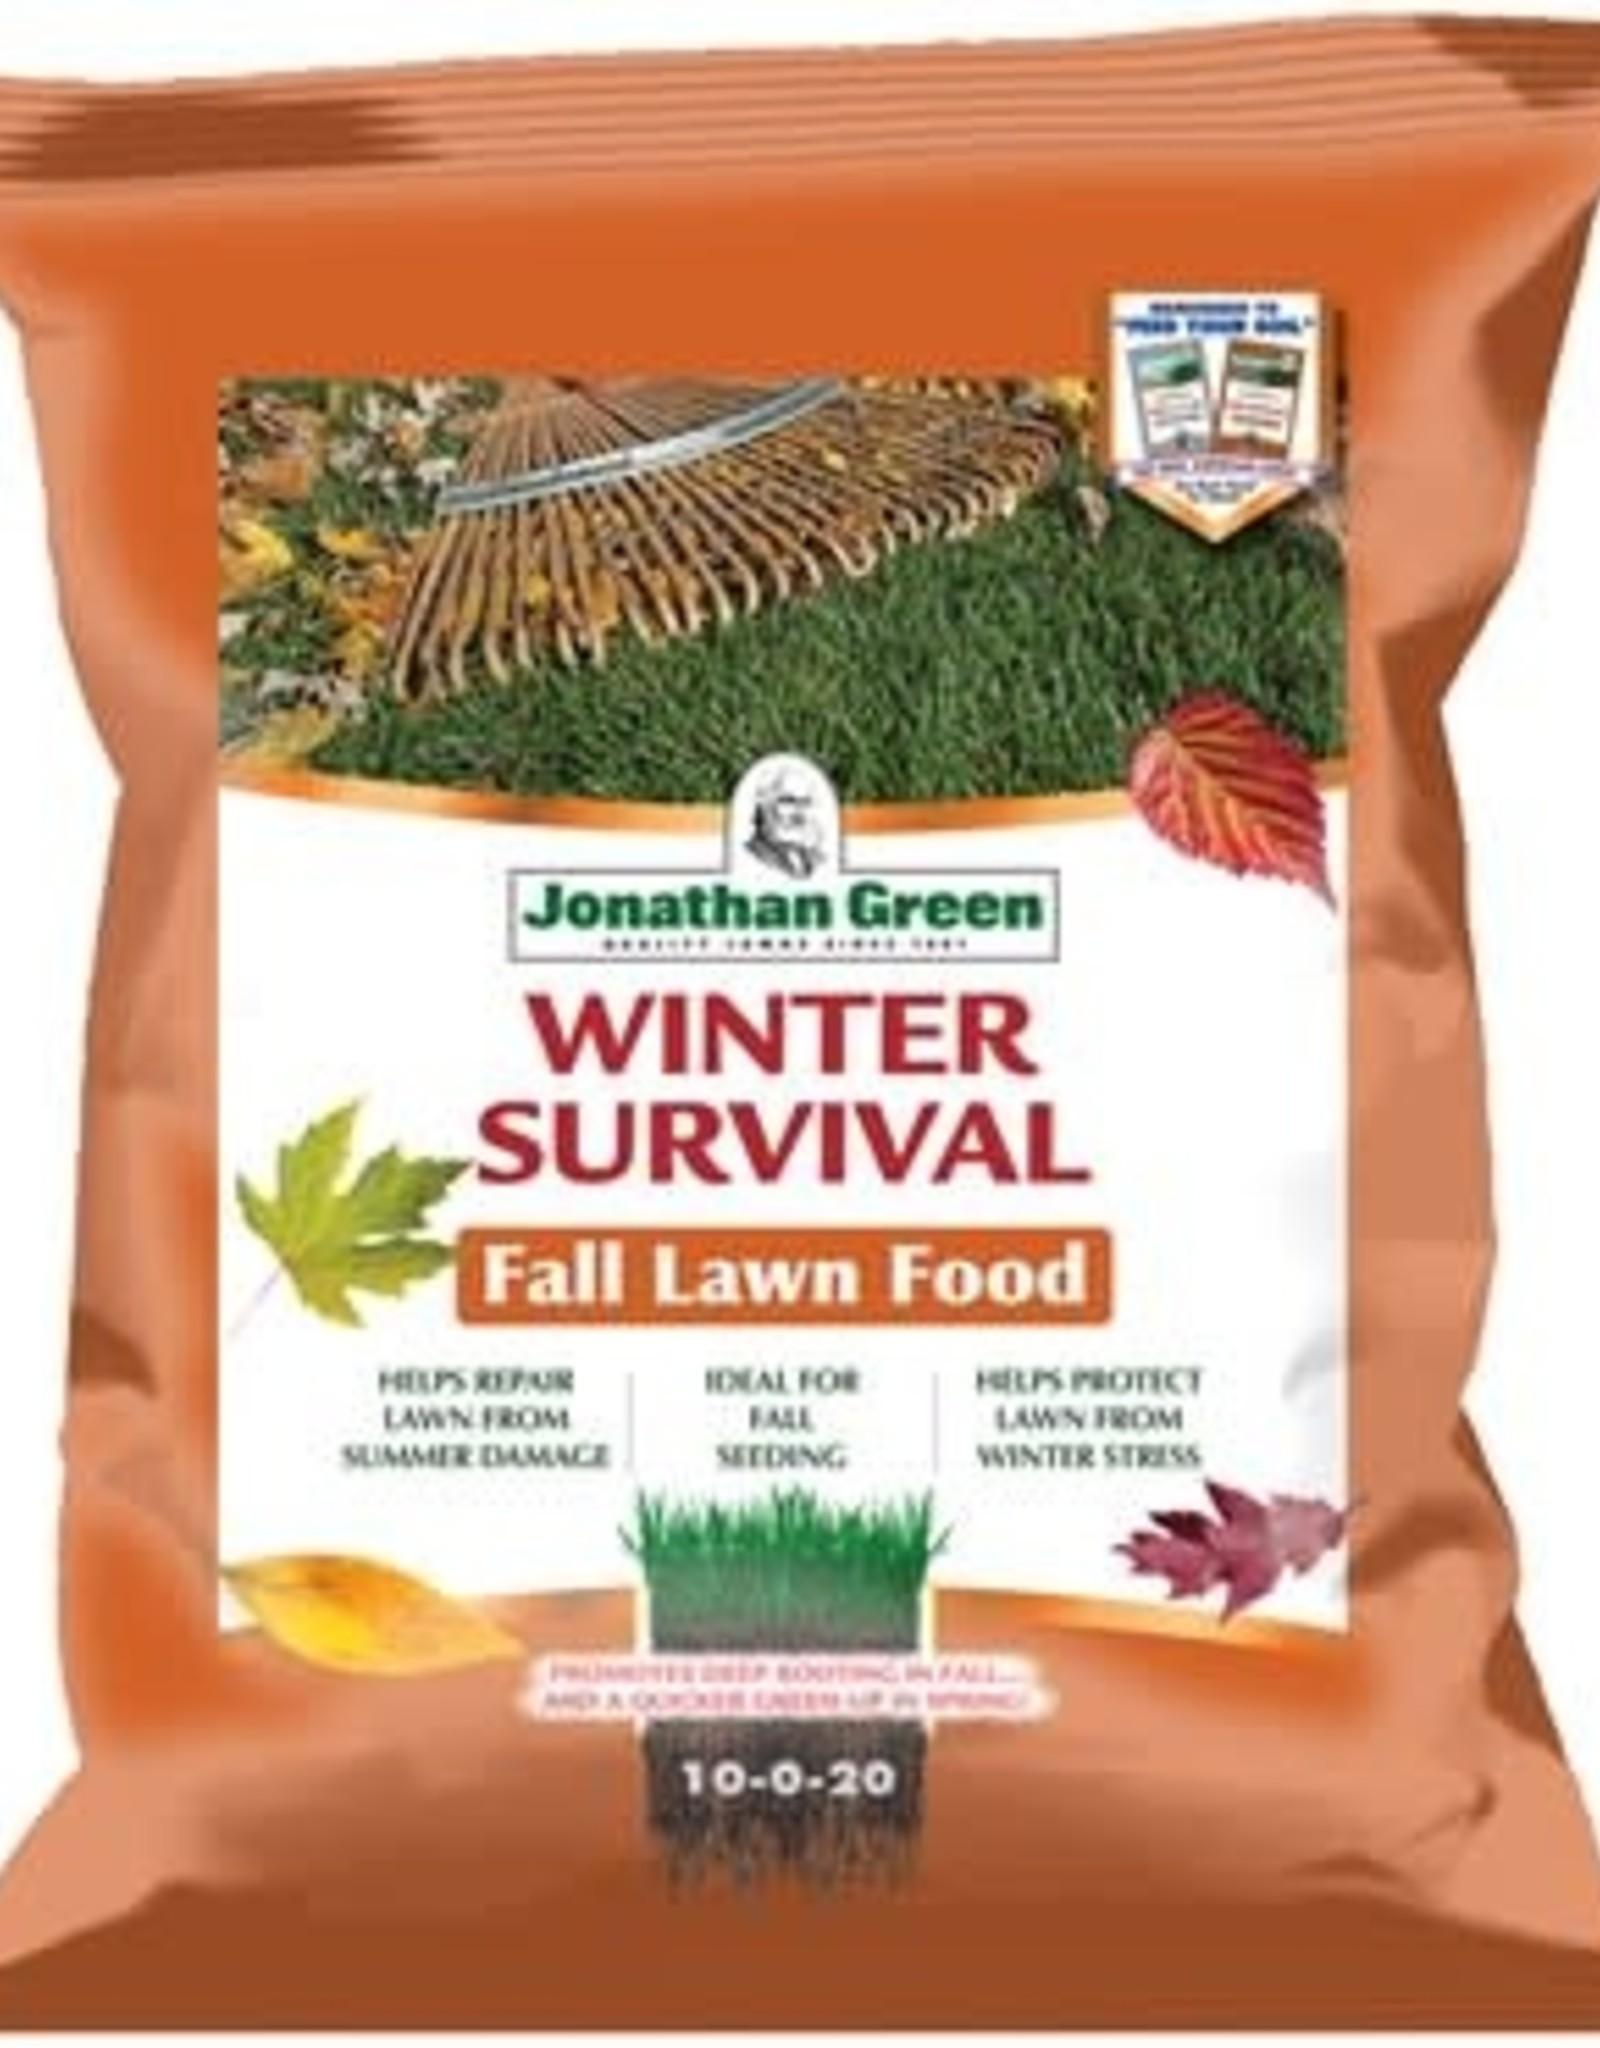 Jonathan Green Winter Survival Fall Lawn Food 15#